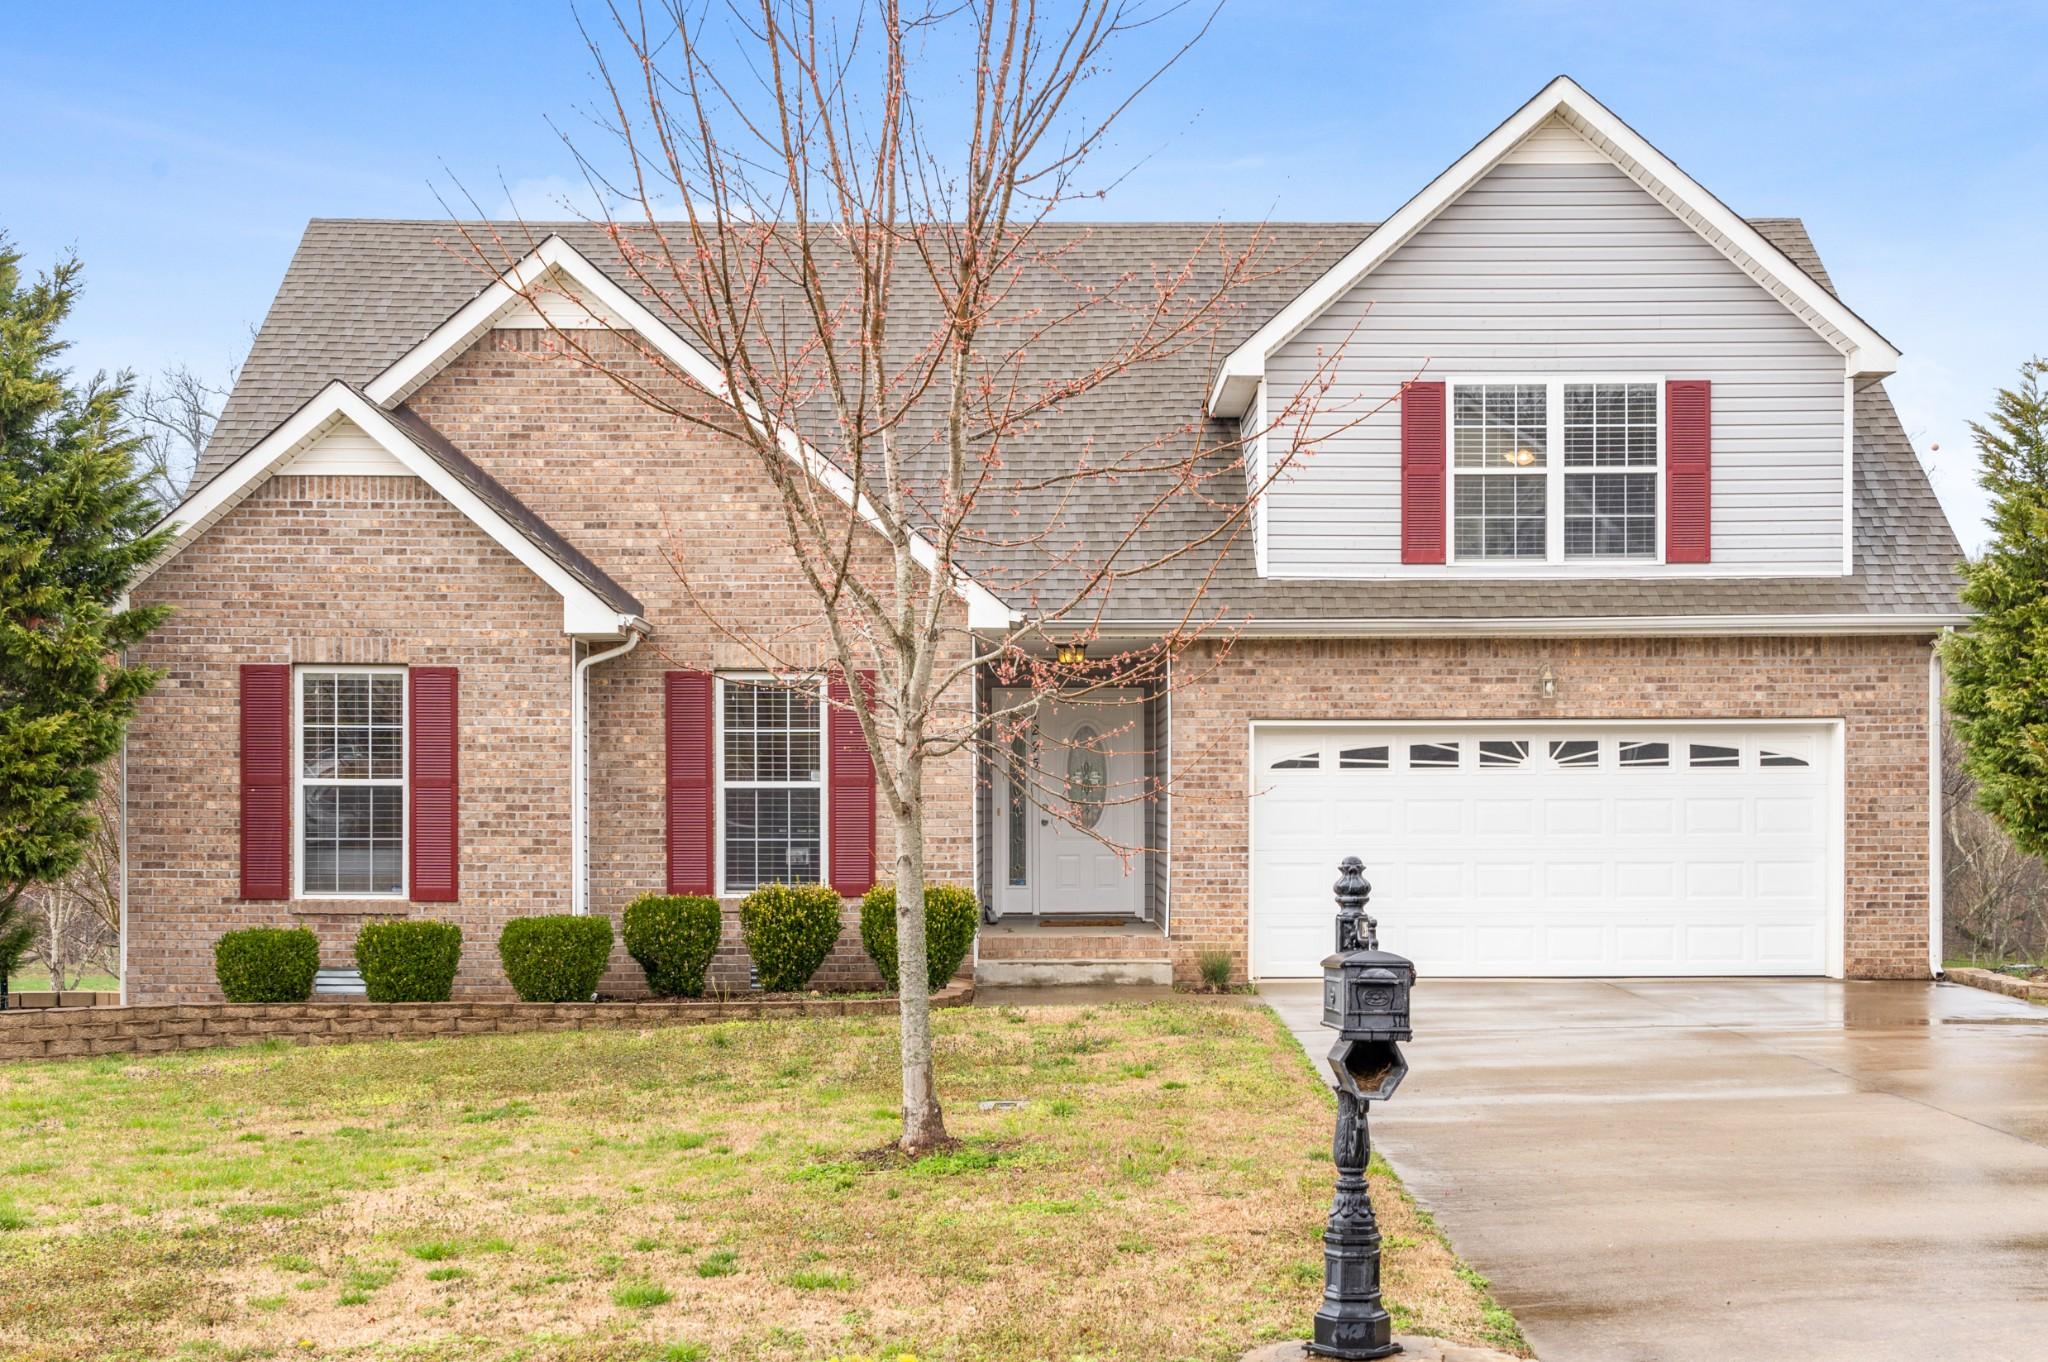 1295 Viewmont Dr, Clarksville, TN 37040 - Clarksville, TN real estate listing